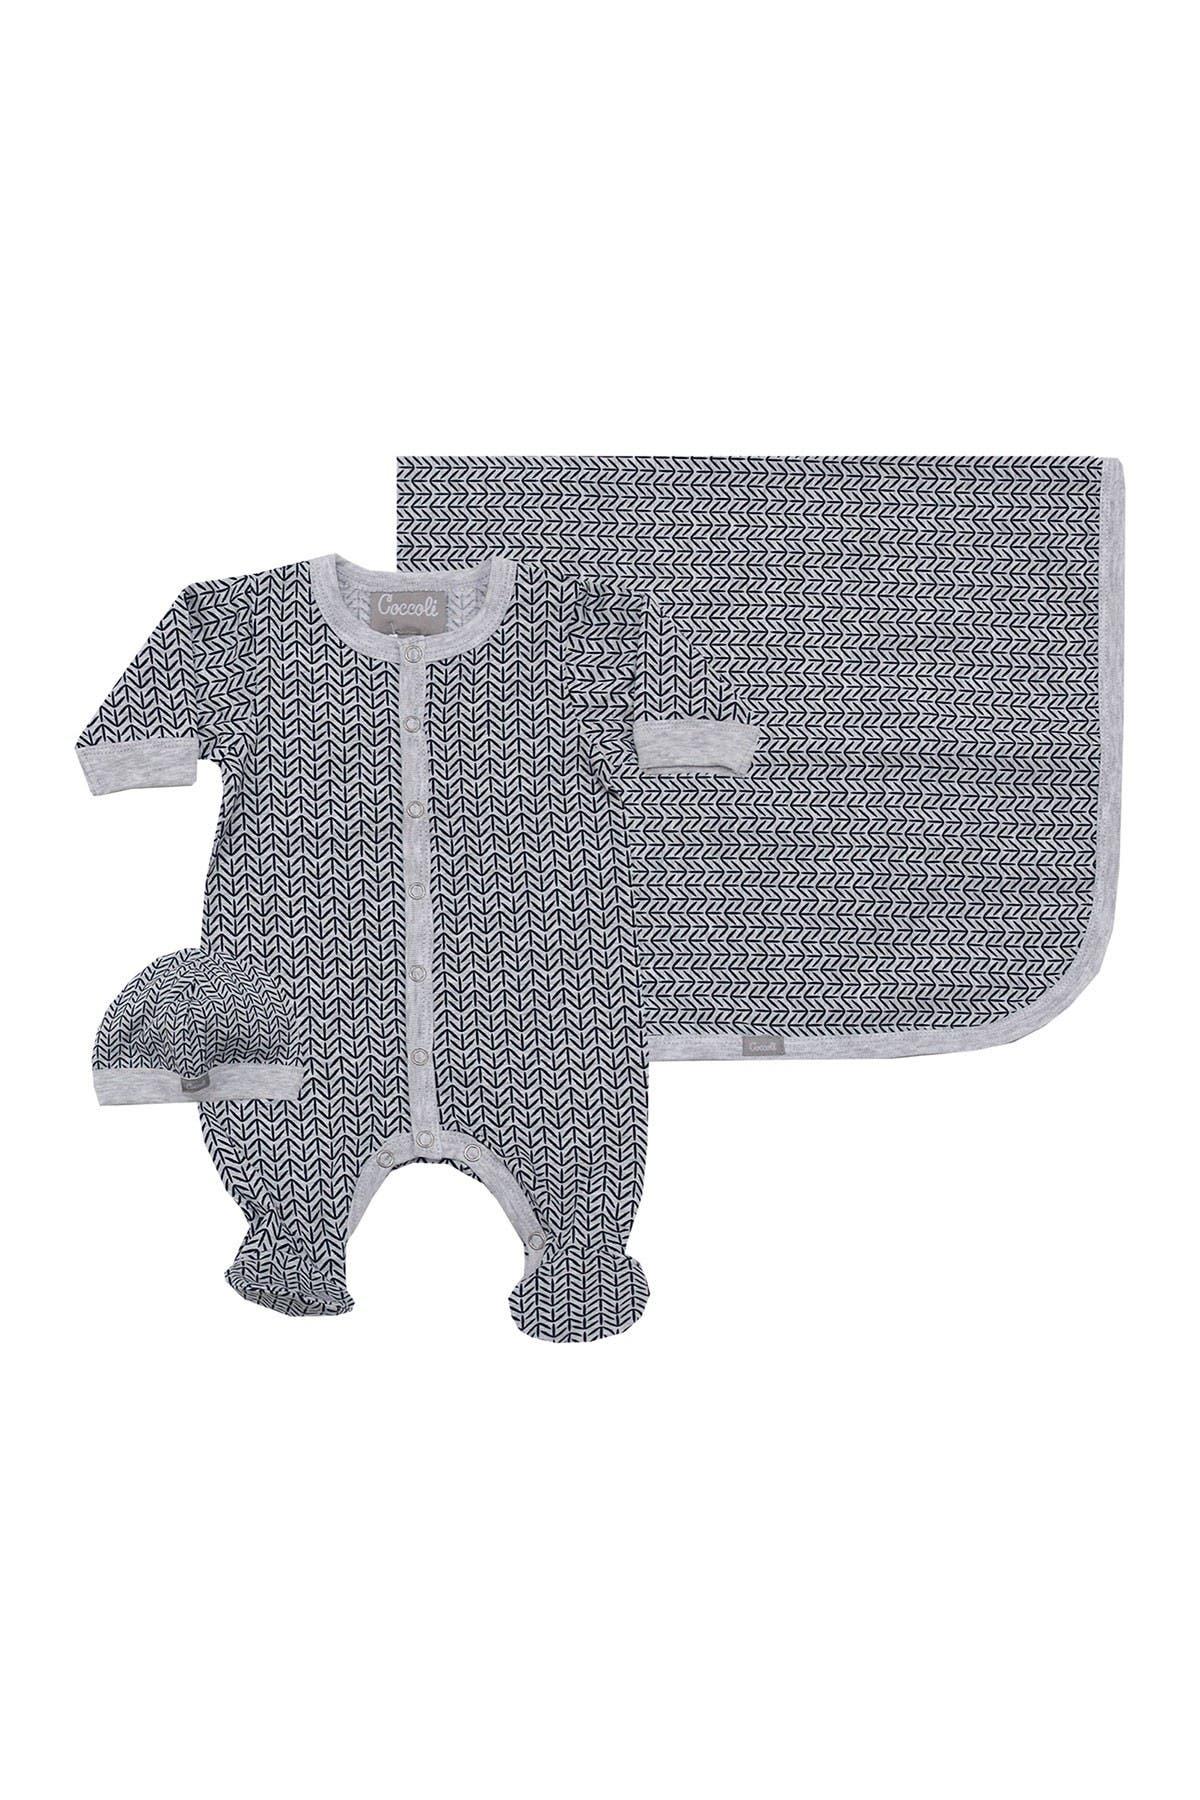 Image of Coccoli Footie Bodysuit, Cap, & Blanket Set